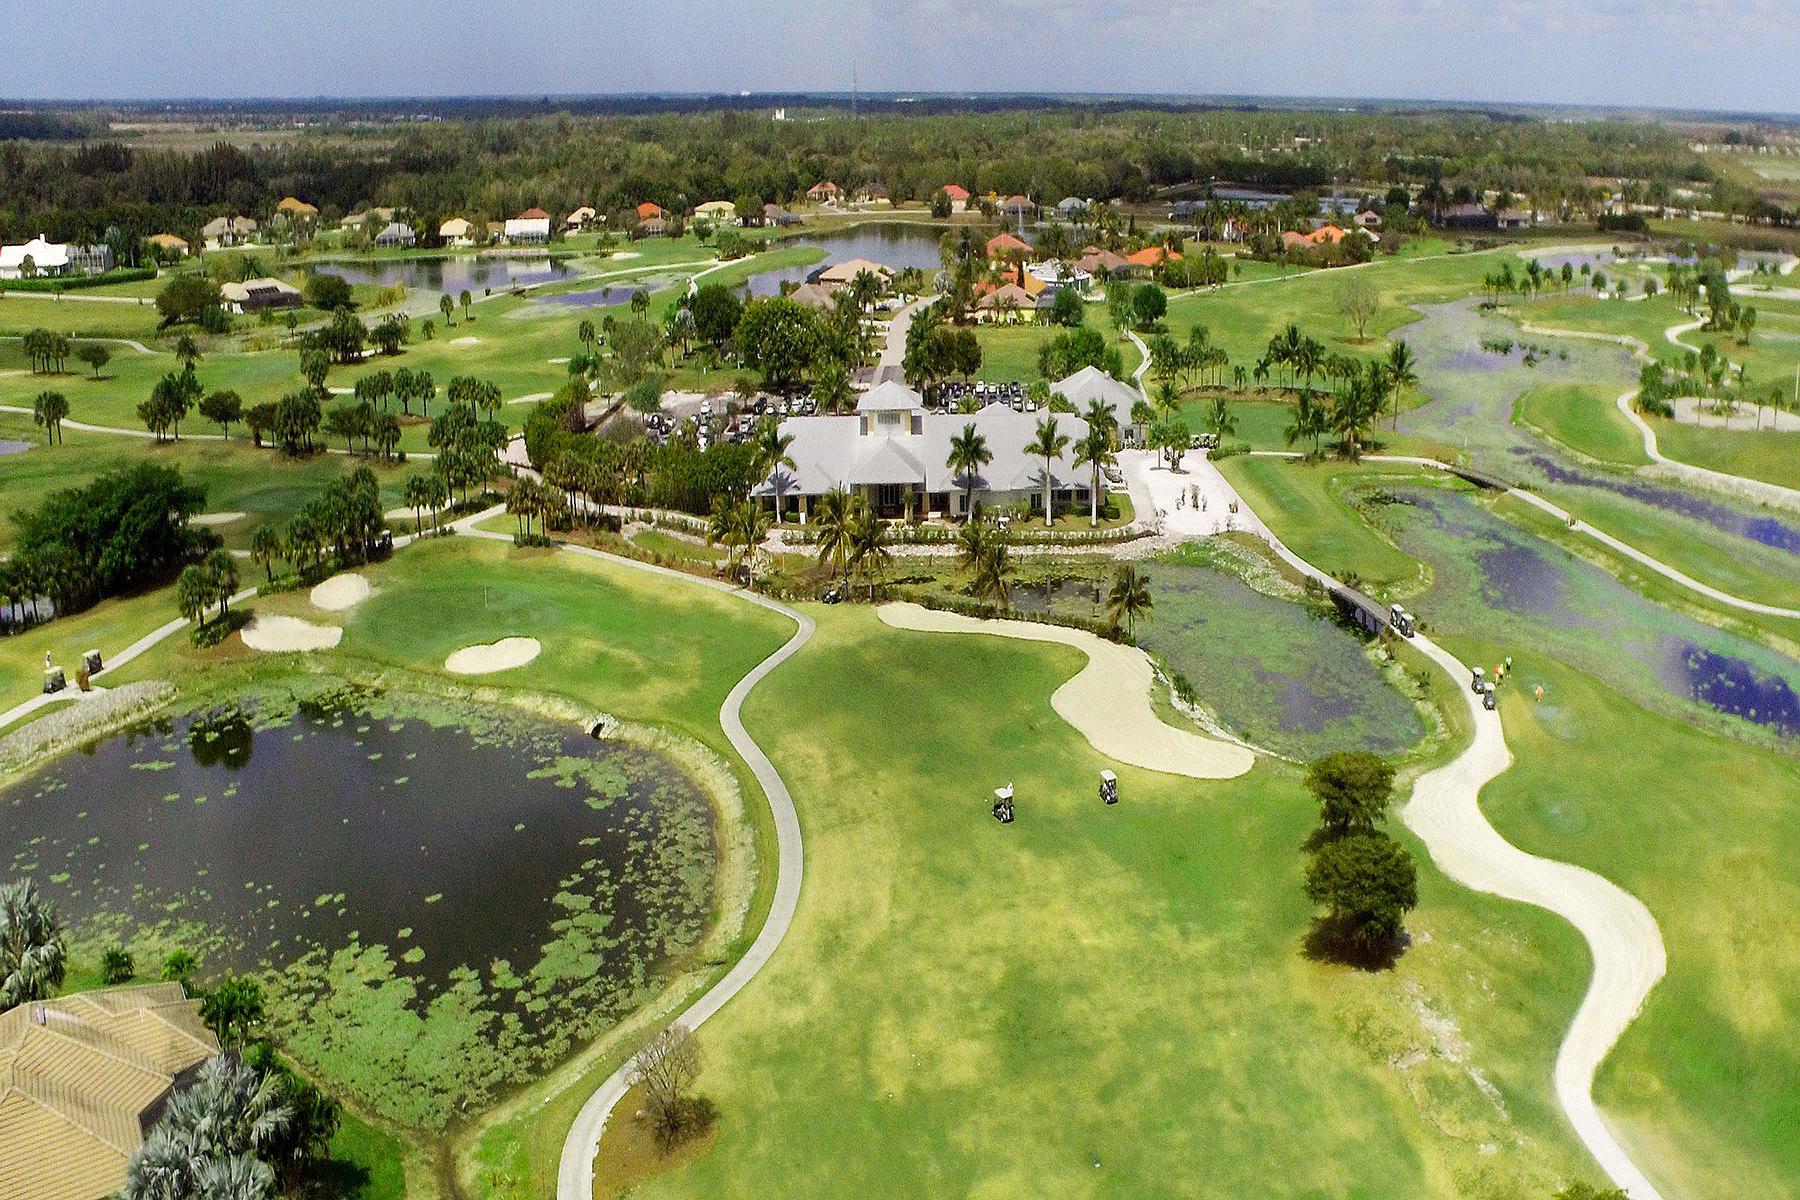 Terreno per Vendita alle ore ROYAL PALM GOLF ESTATES 18570 Royal Hammock Blvd Naples, Florida, 34114 Stati Uniti